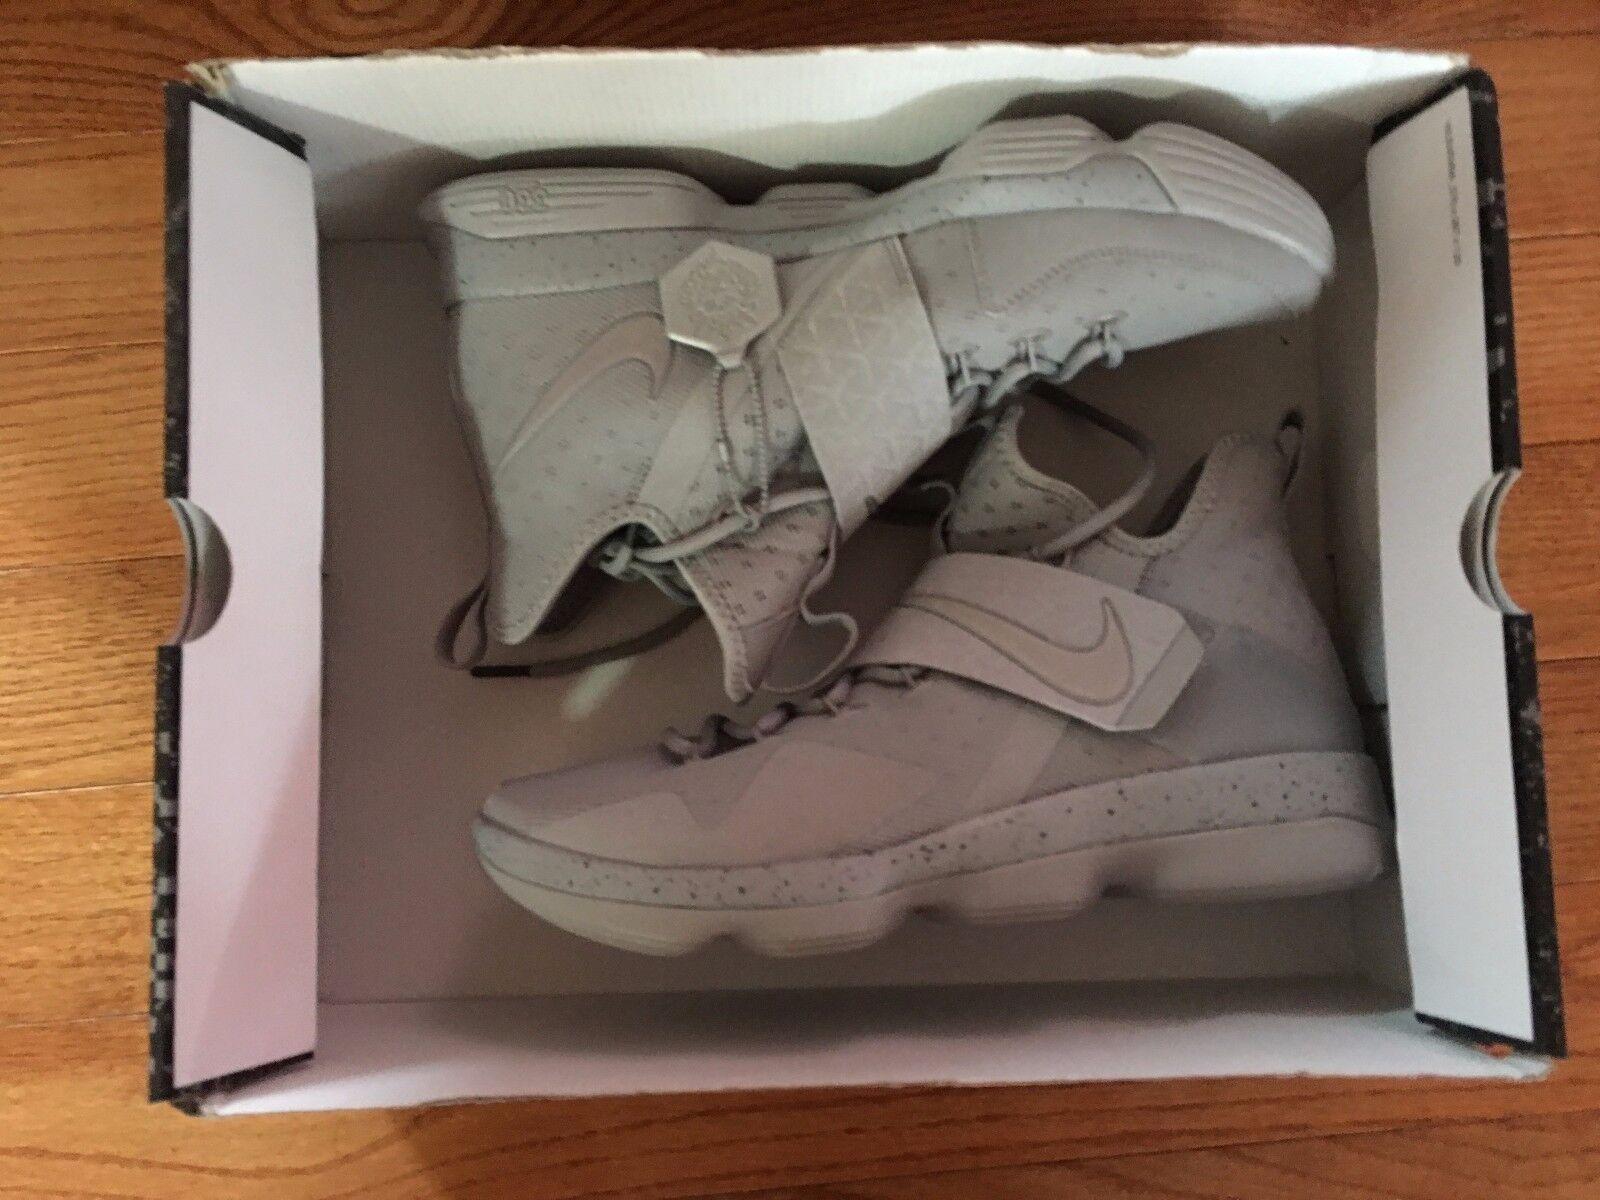 Nike Lebron XIV 14 Silver White Reflective Grey LeBron James Size 10.5 DS NEW